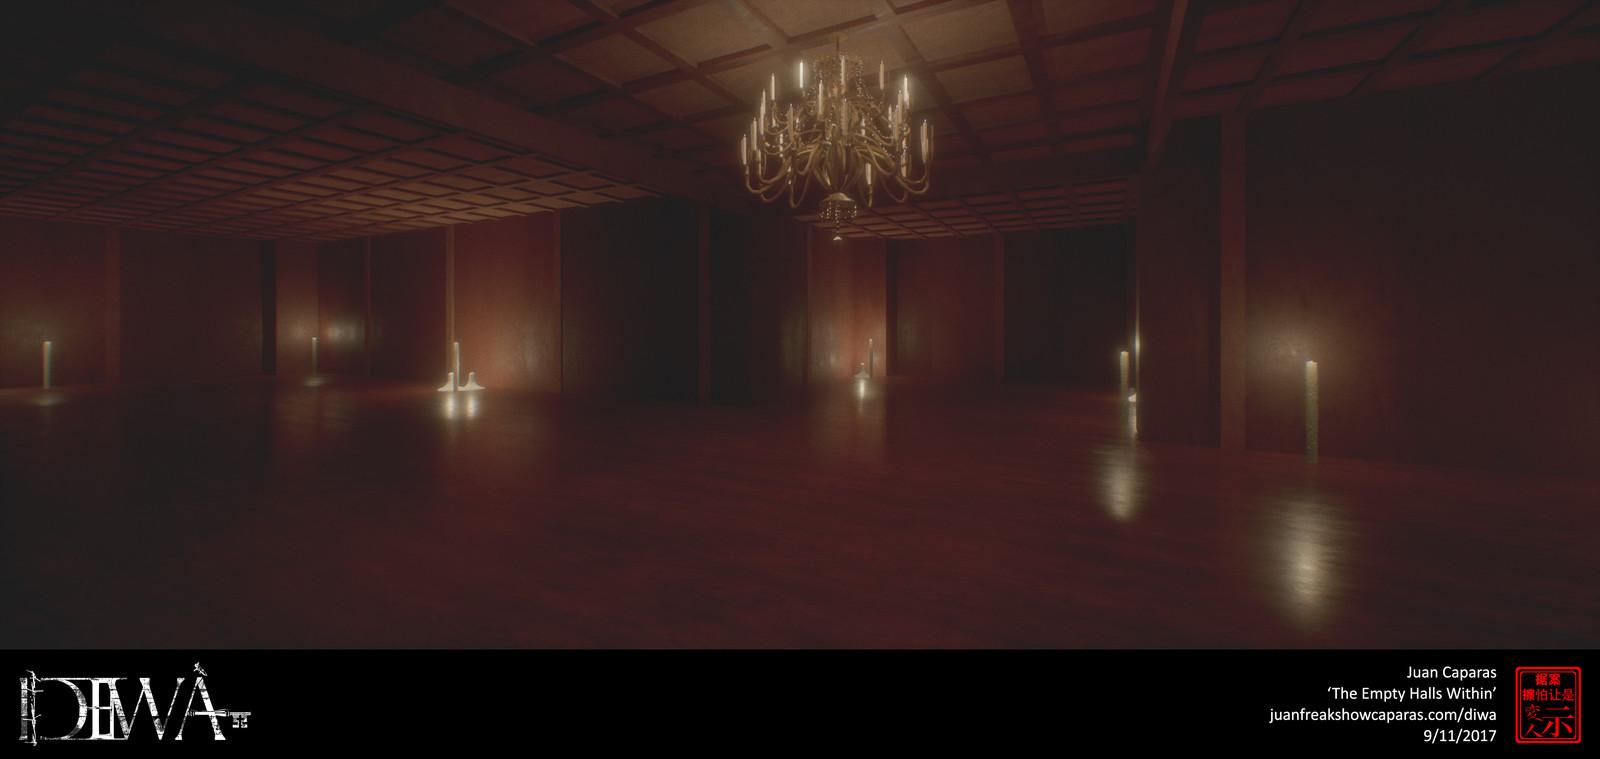 The Empty Halls Within - DIWÀ